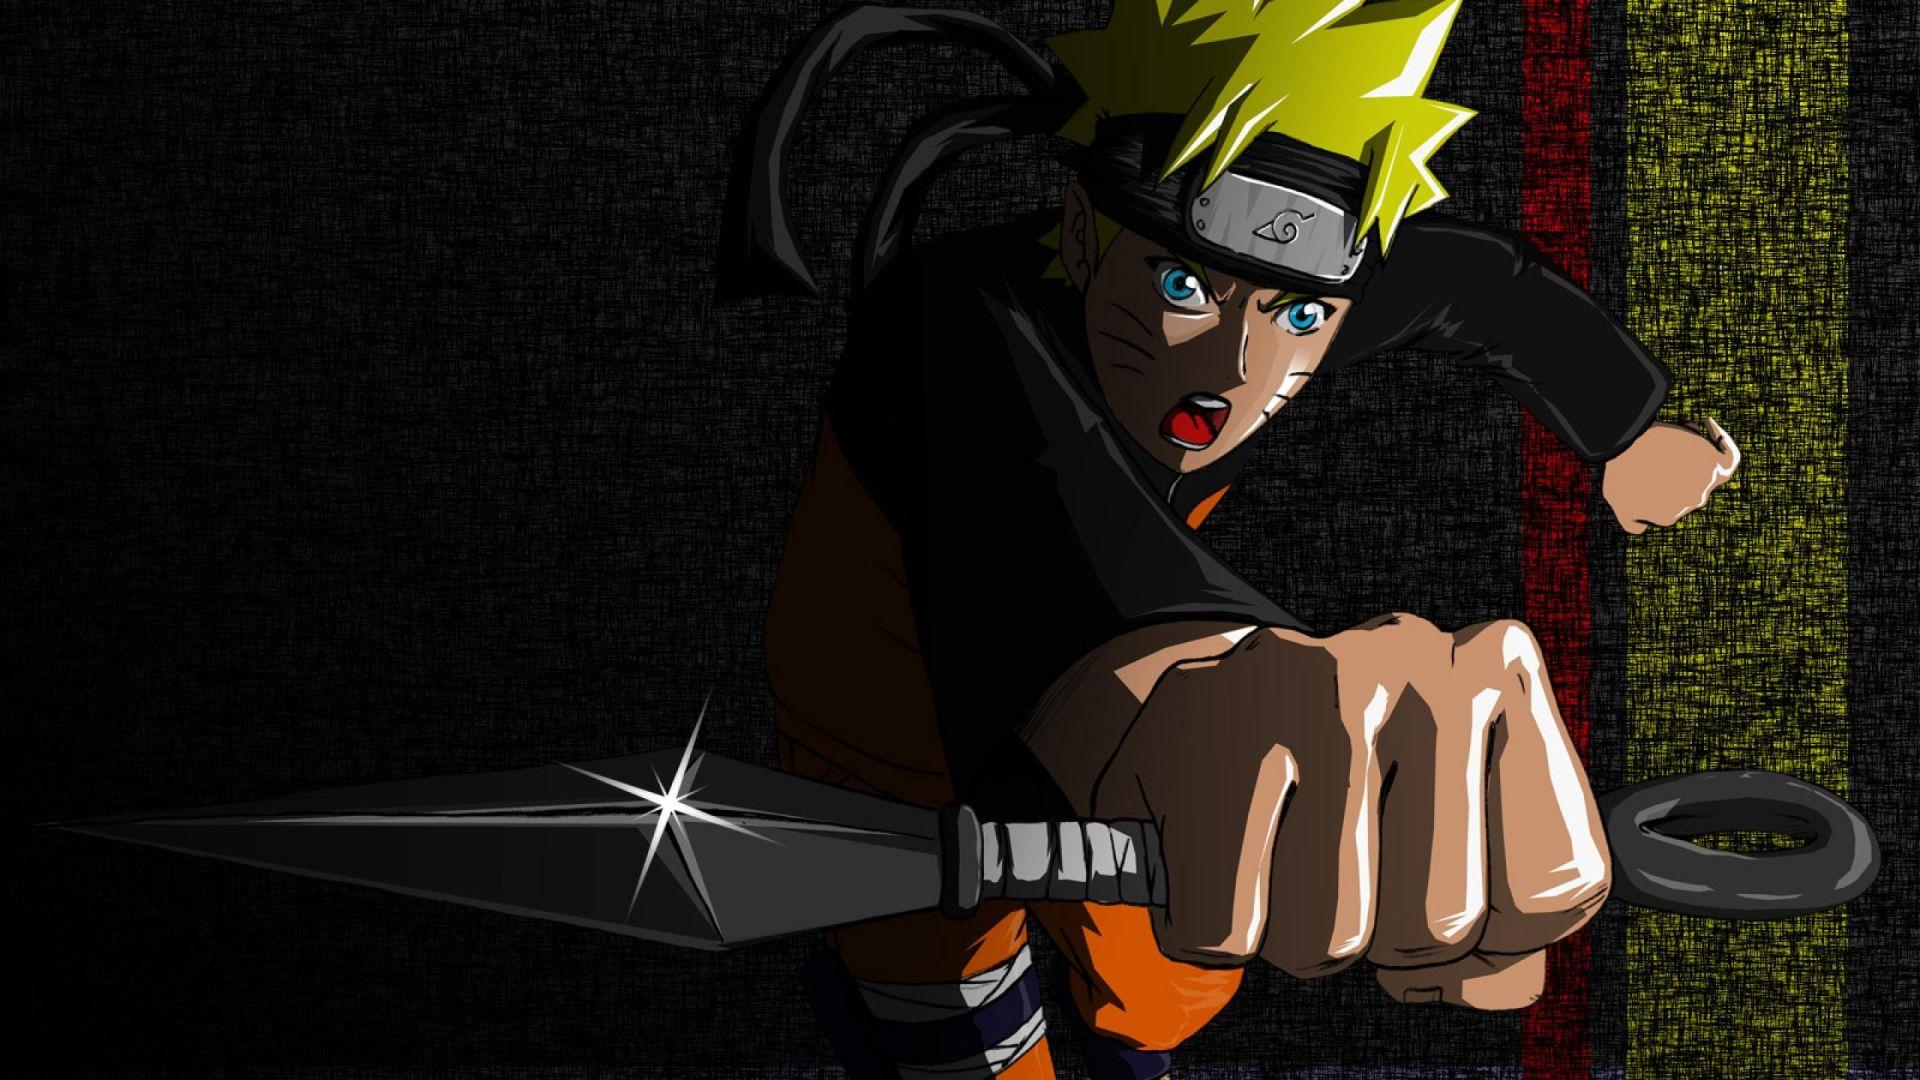 Naruto Wallpaper HD, Cool HD Wallpaper